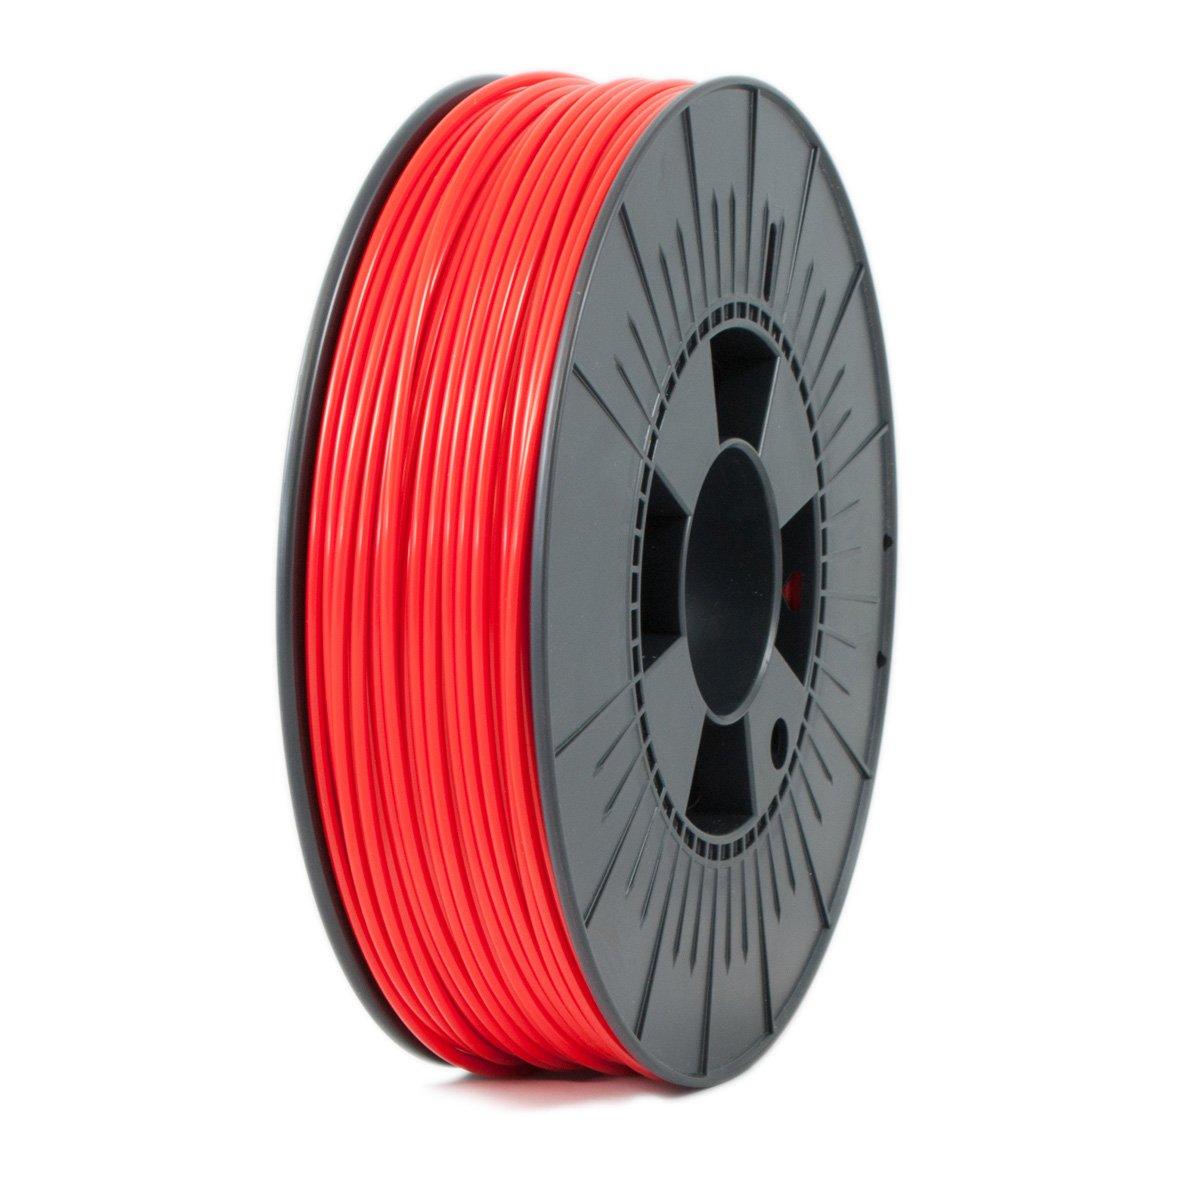 Ice Filaments ICEFIL3PLA010 Filamento PLA, 2,85 mm, 0,75 kg, Rojo